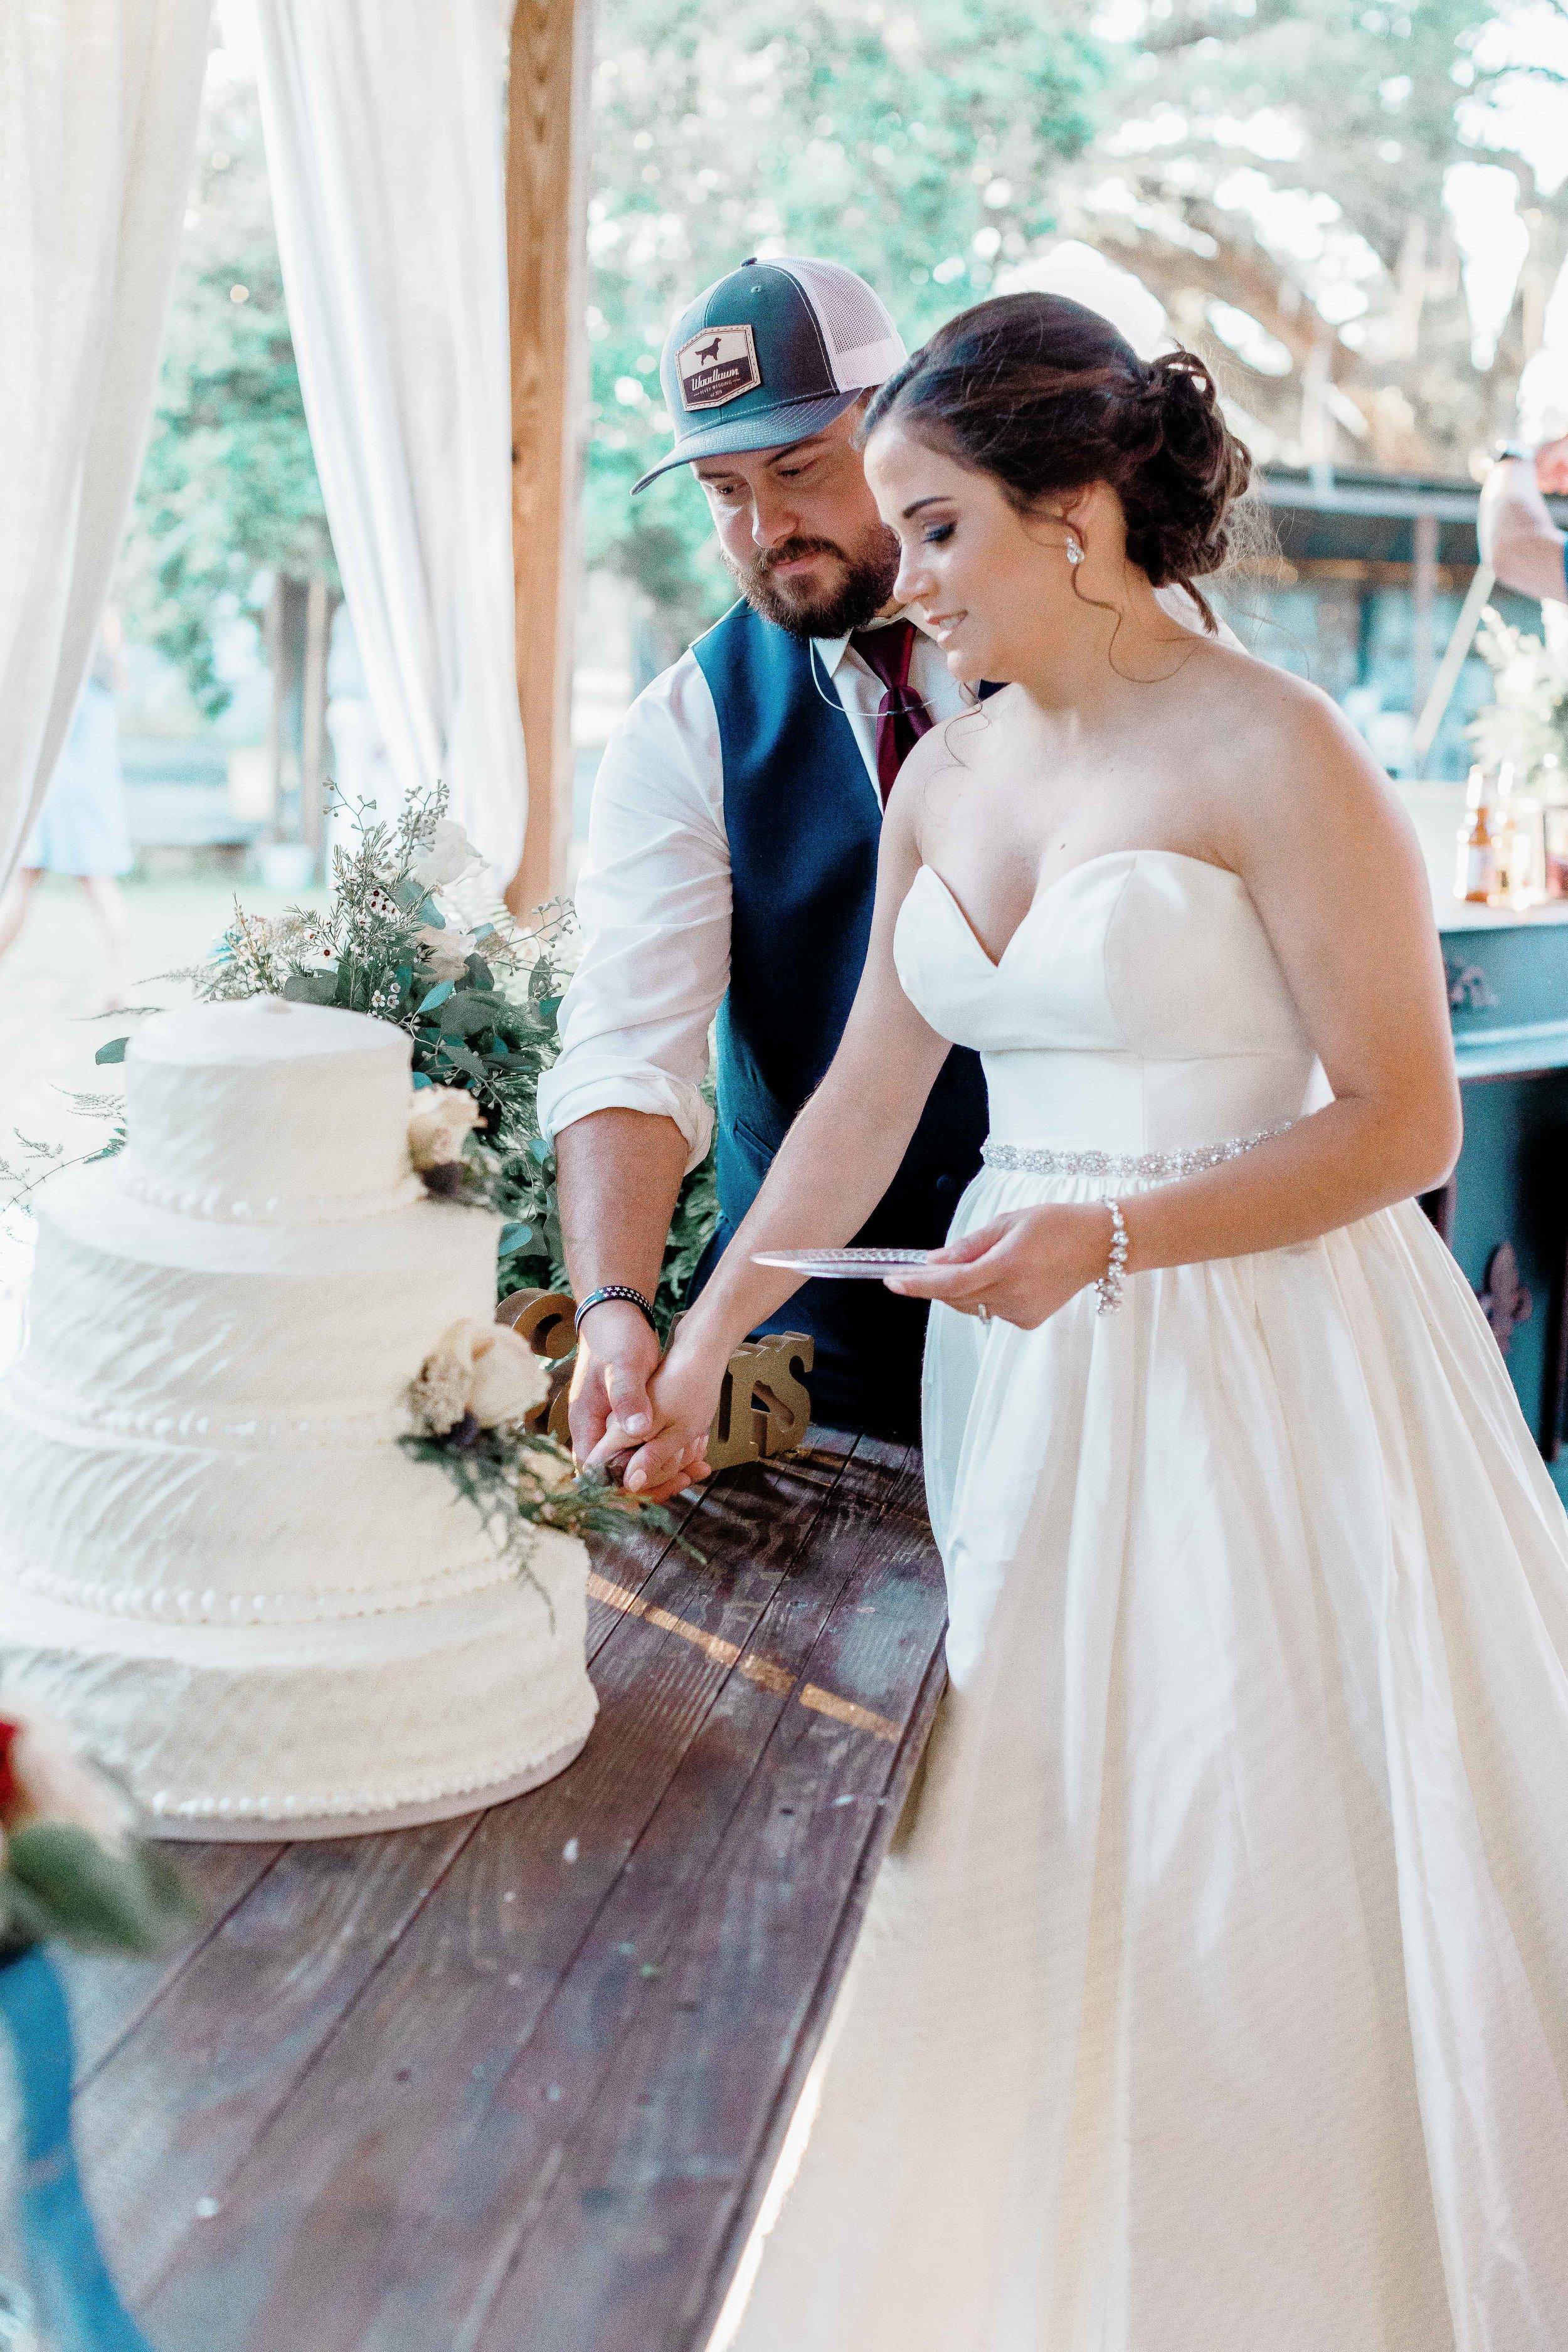 20190427-Southern Lens Photography- Savannah Wedding Photographer-Screven and Caroline-201996.jpg